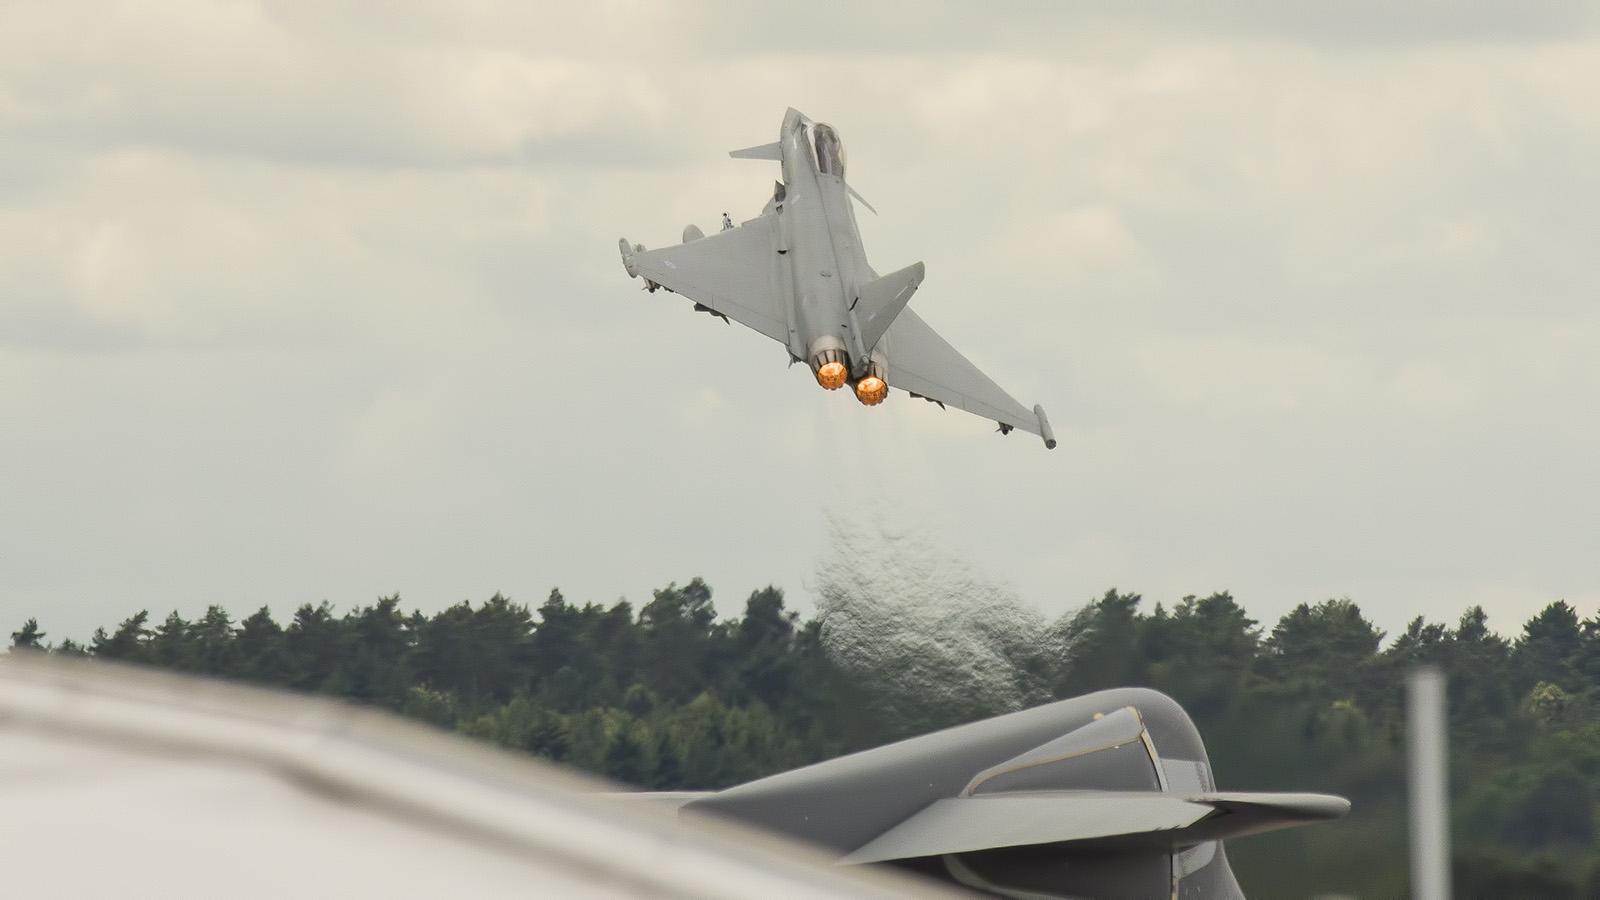 _IMG5753 Eurofighter EF-2000 Typhoon FGR4 RAF ZK356 s